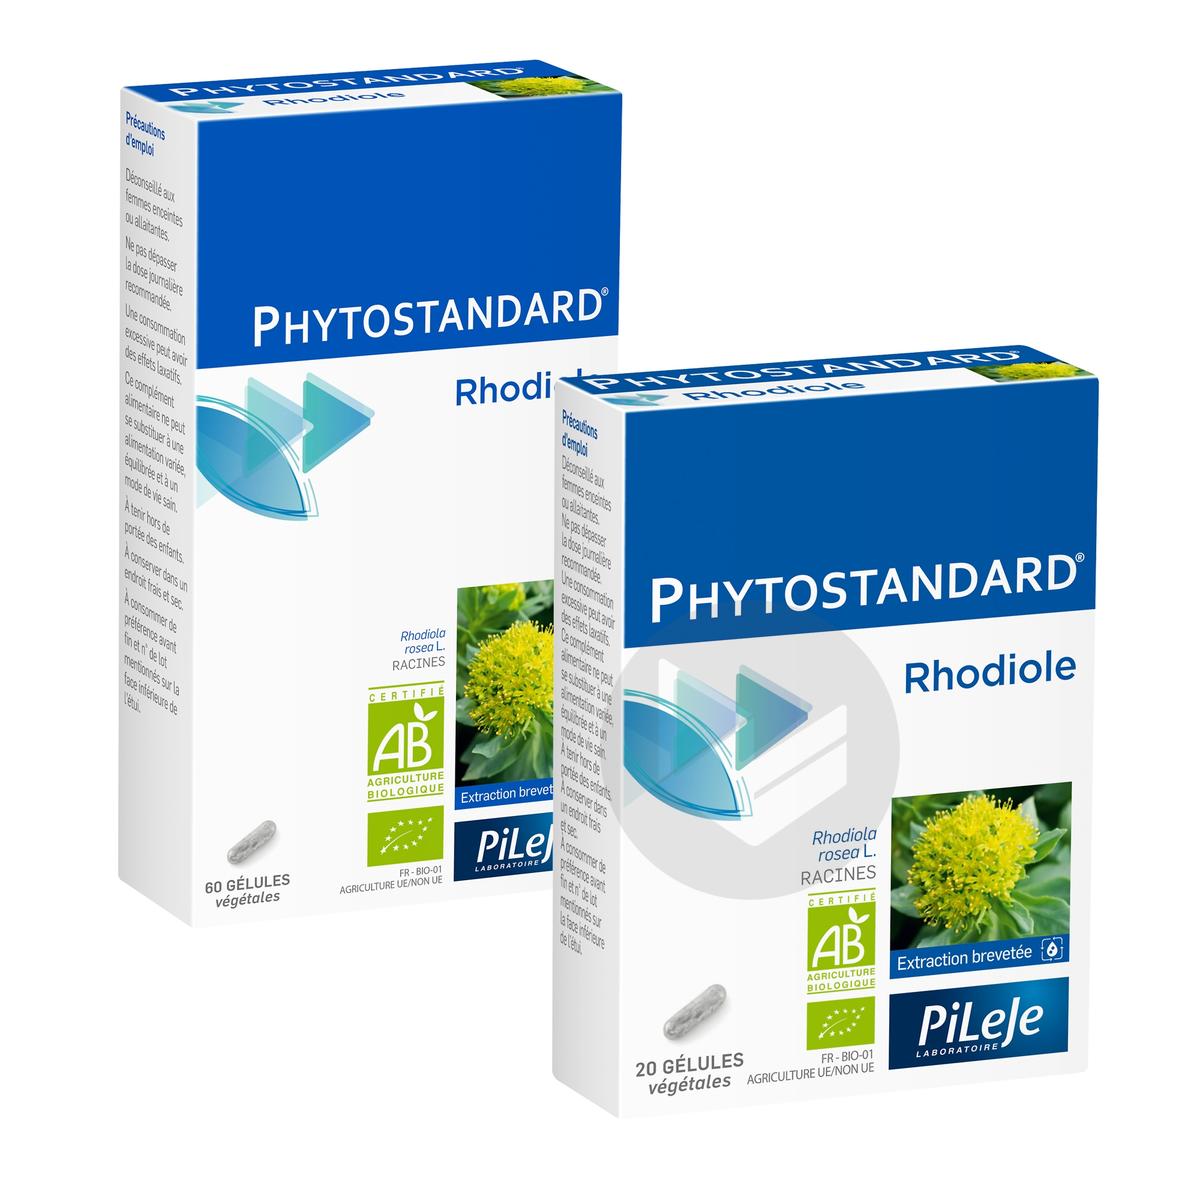 Phytostandard Rhodiole Safran Cpr B 30